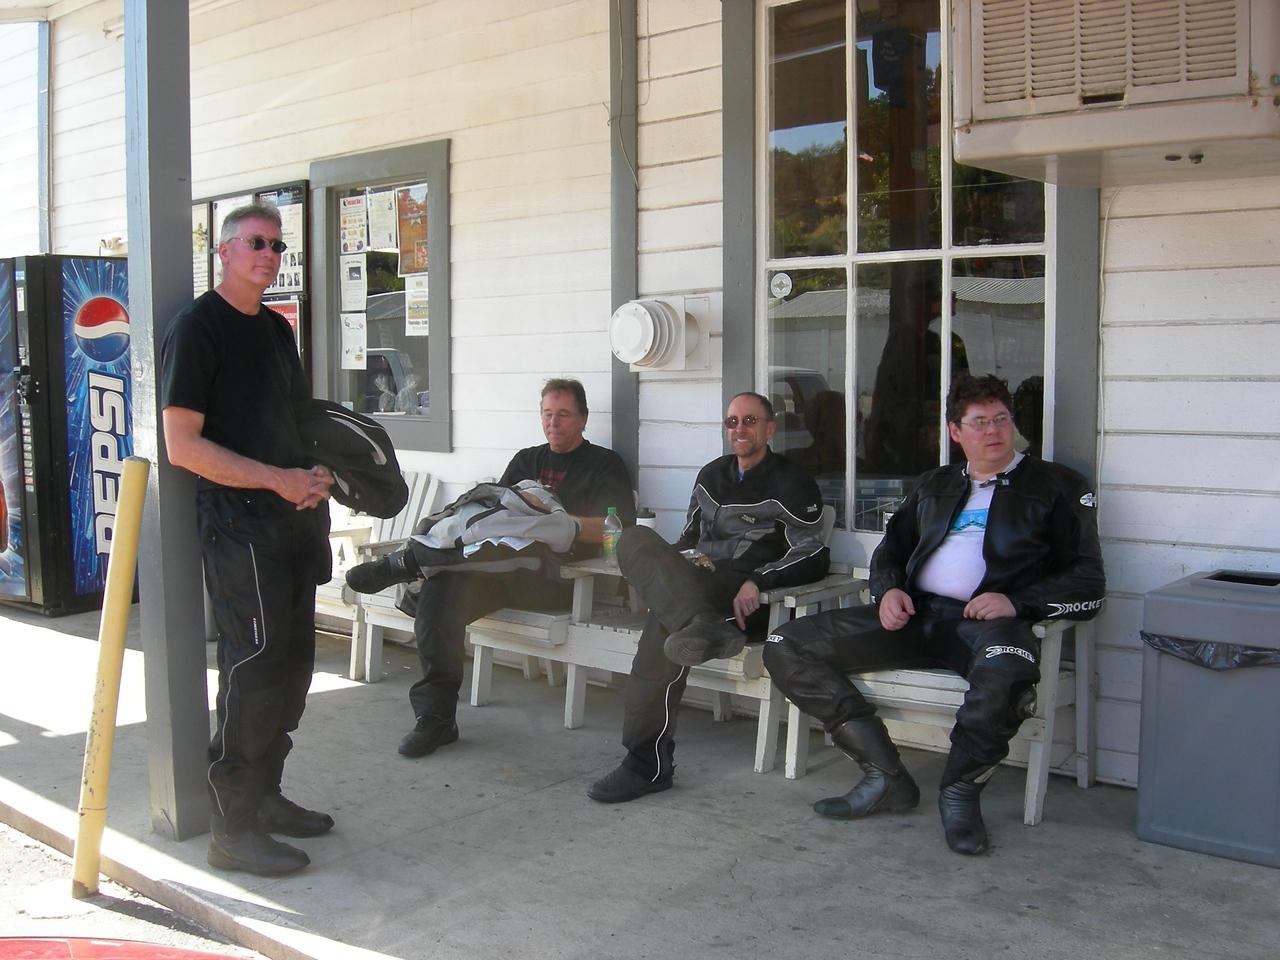 Mario, David, Bob and Ryan taking a break in Coppropolis.